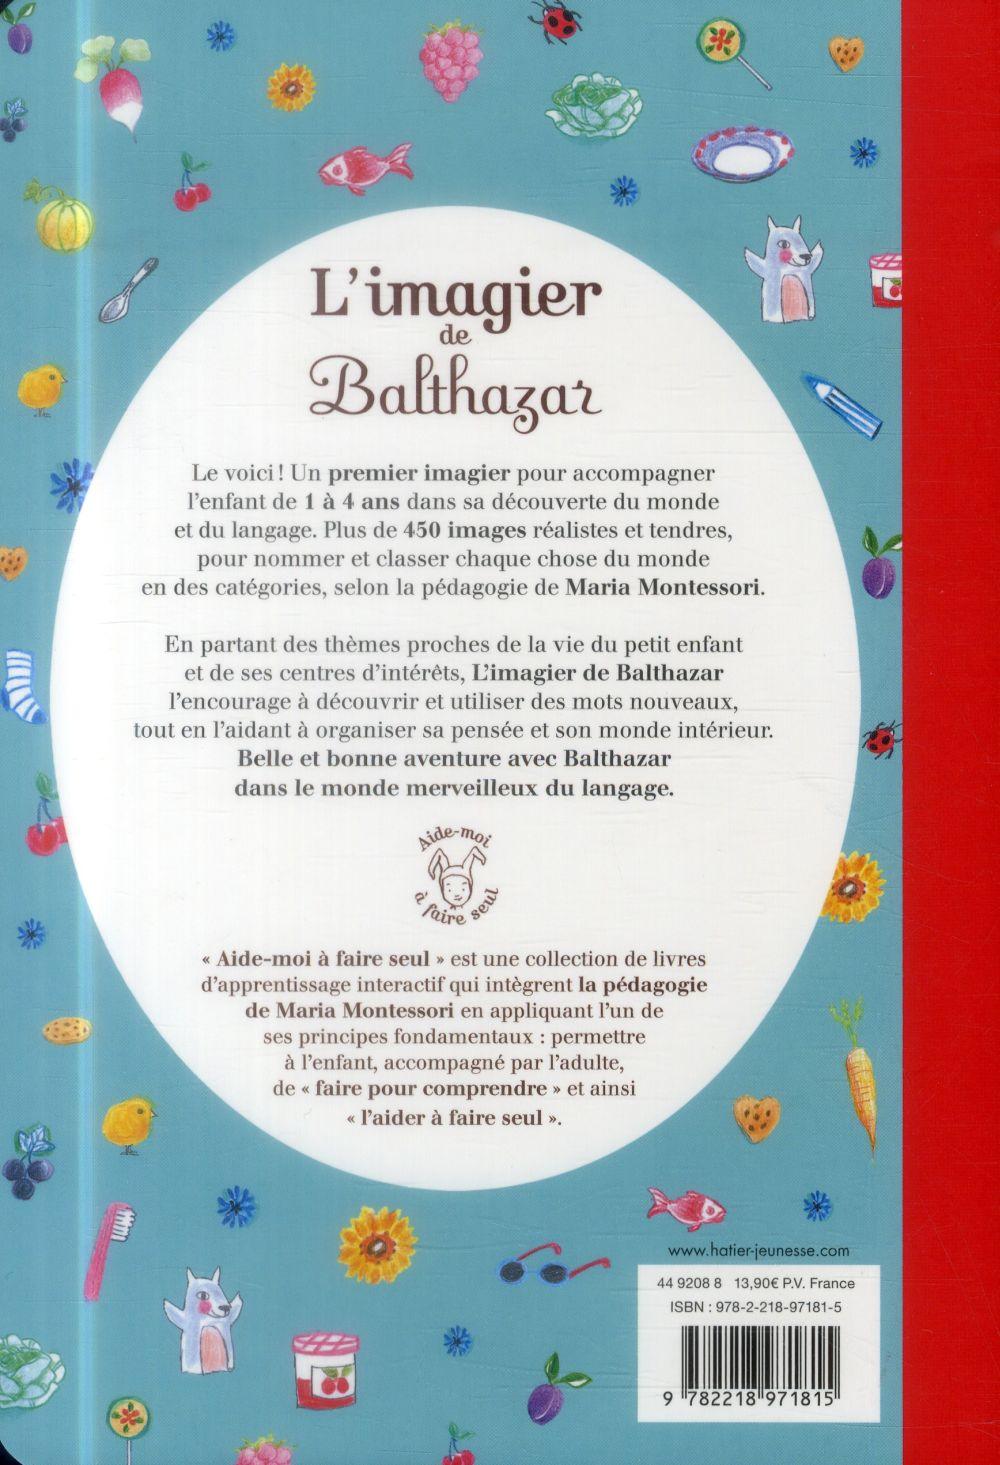 L'imagier de Balthazar